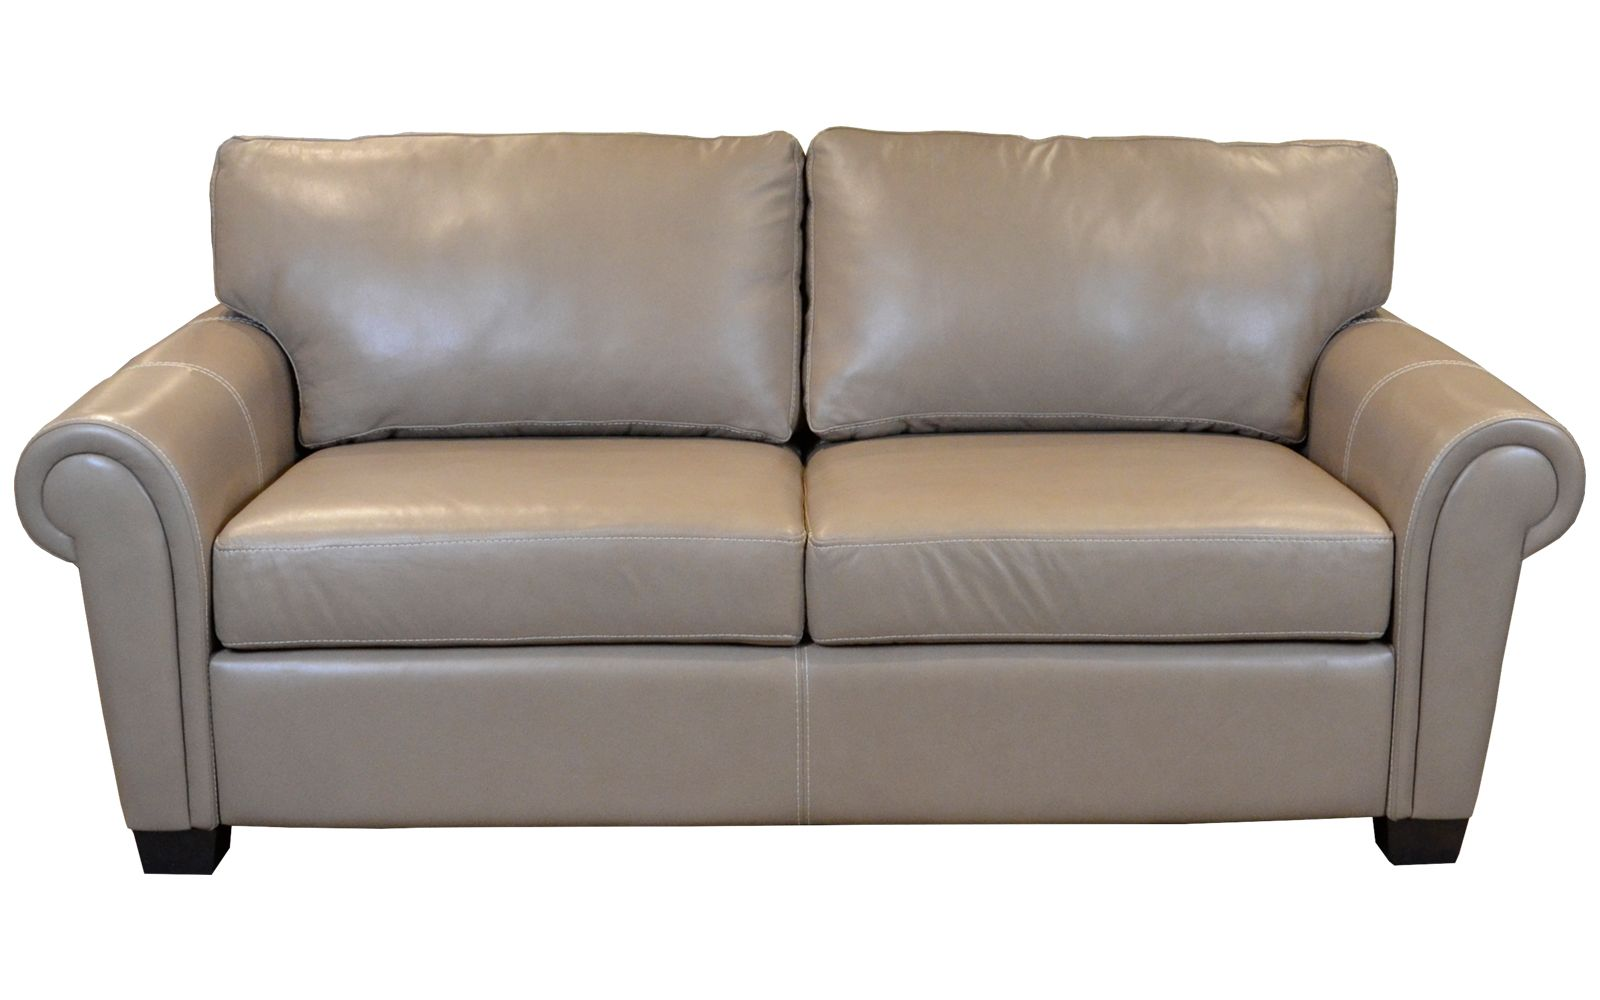 Dreamsations 105 Sofa Texas Leather Furniture Accessories Sofa Love Seat Sleeper Sofa